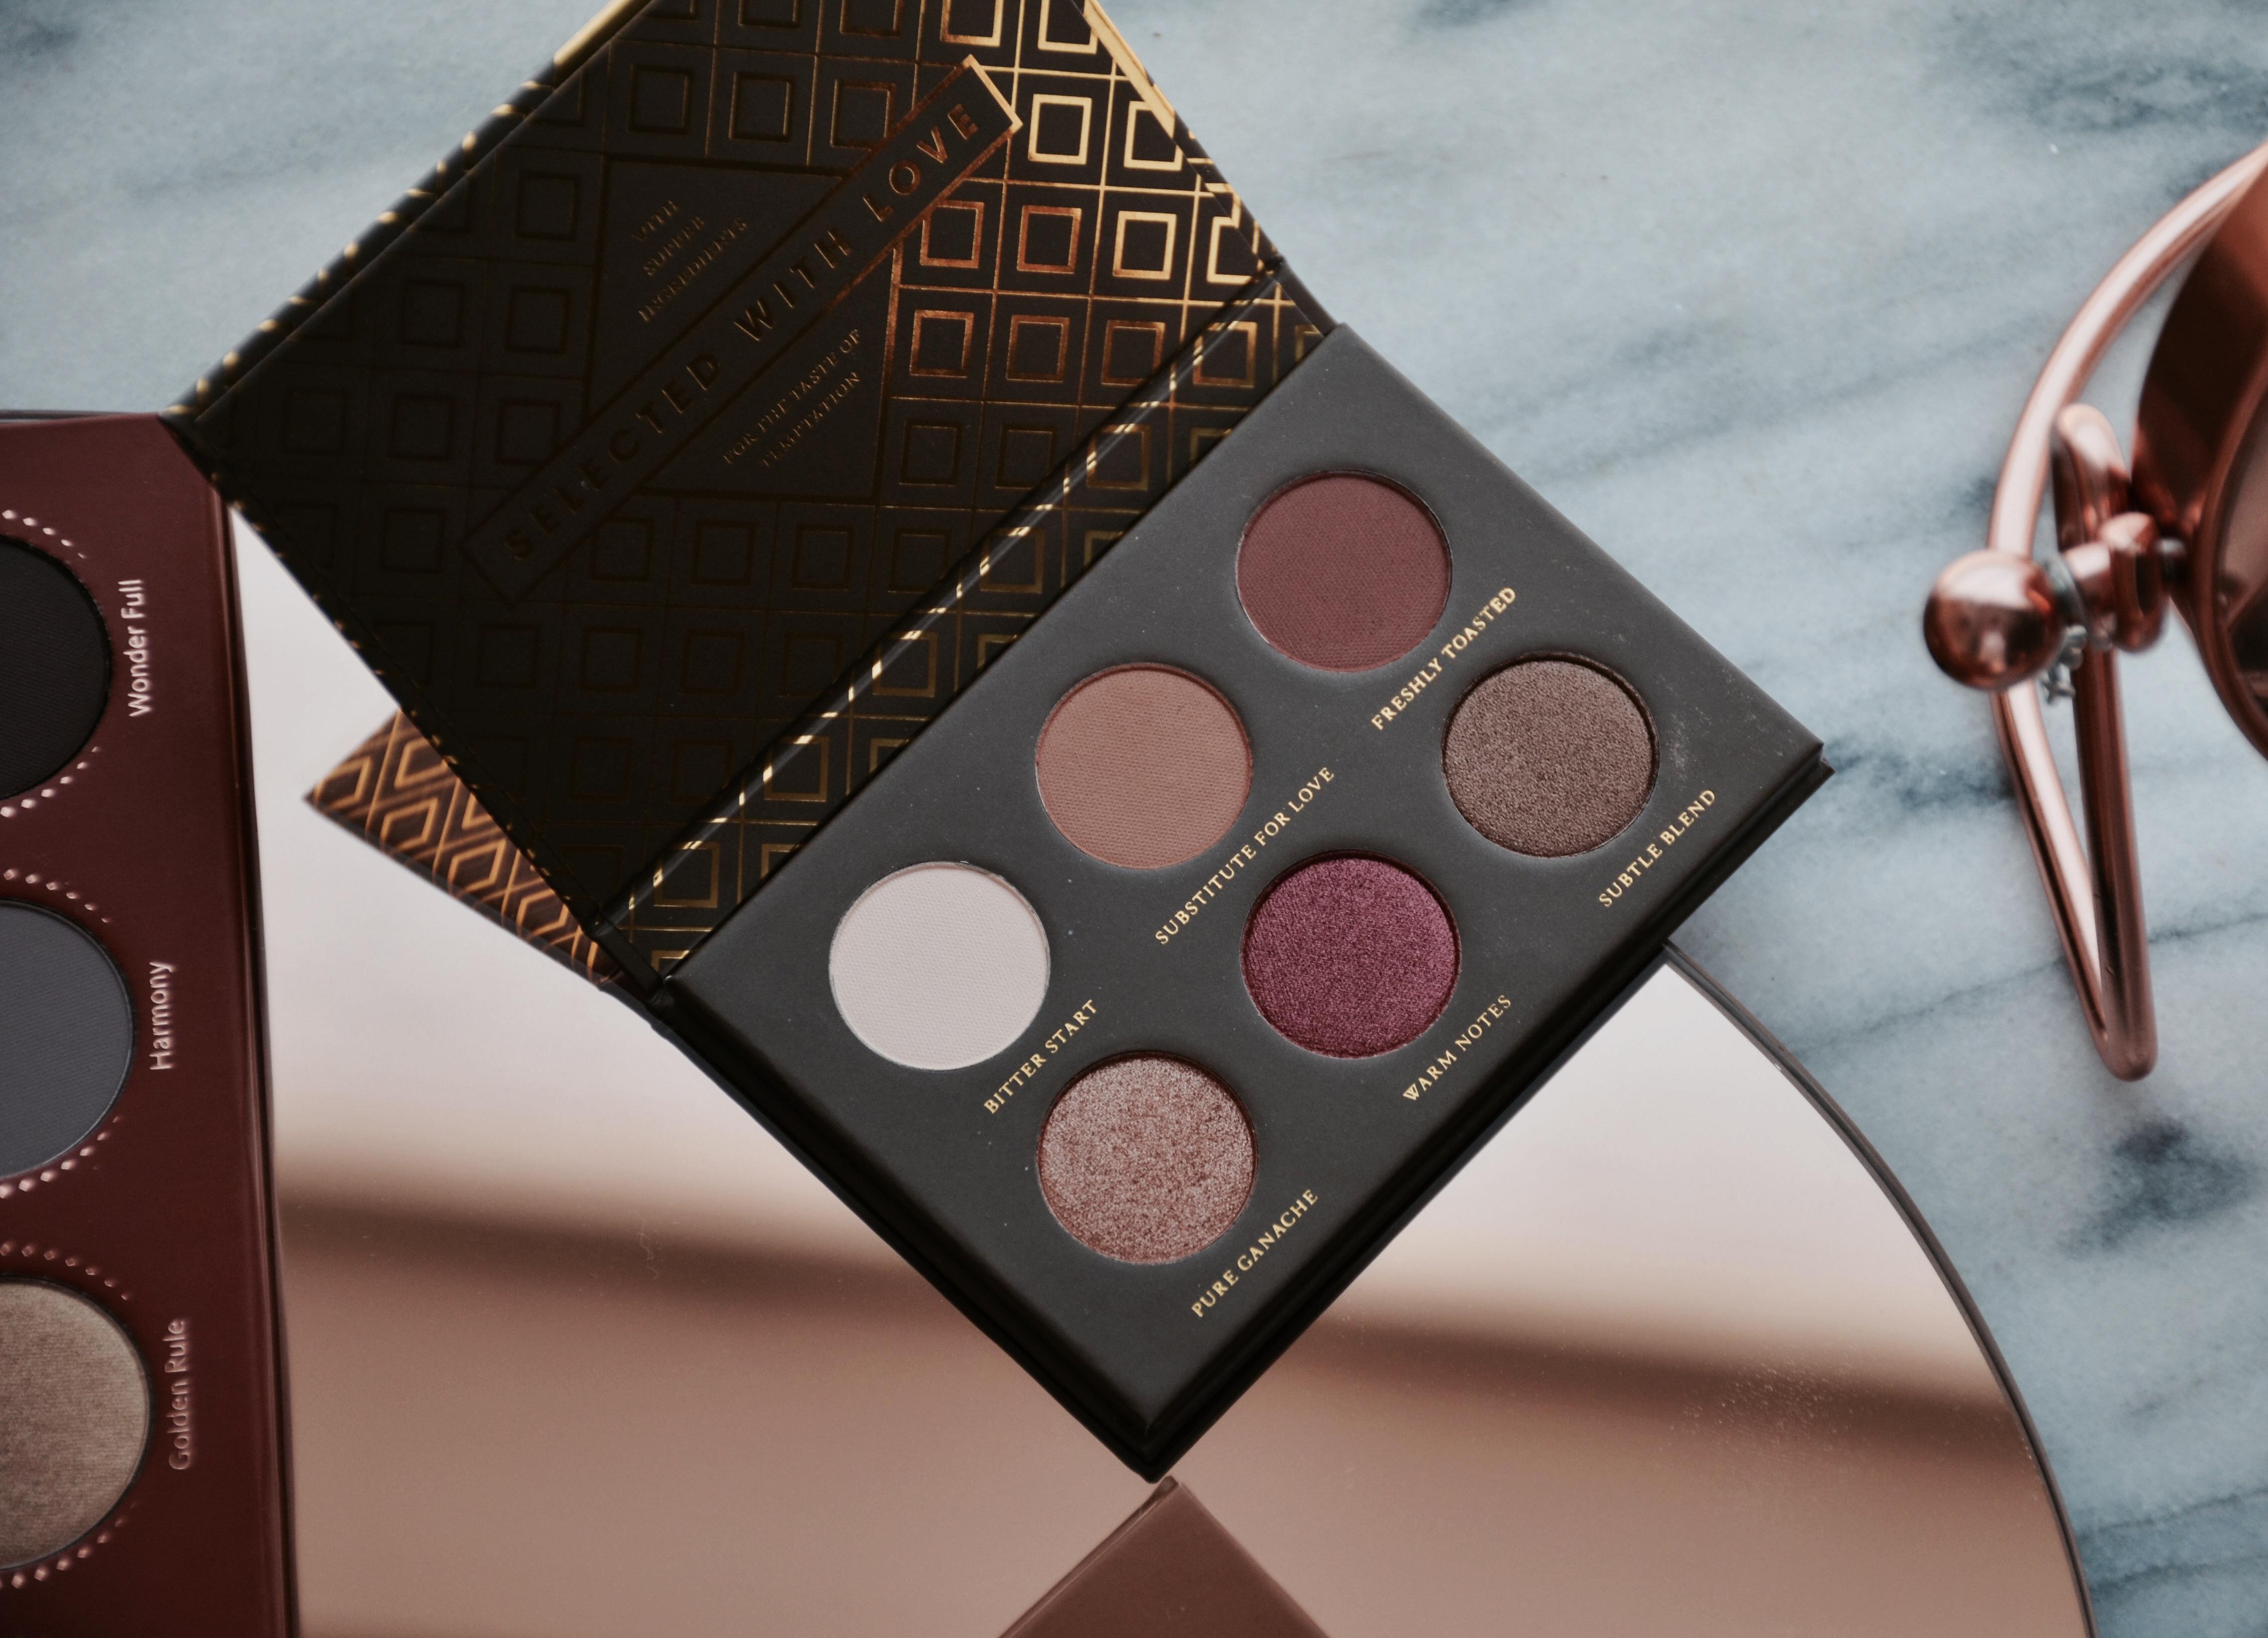 Zoeva Cocoa Blend Voyager Palette